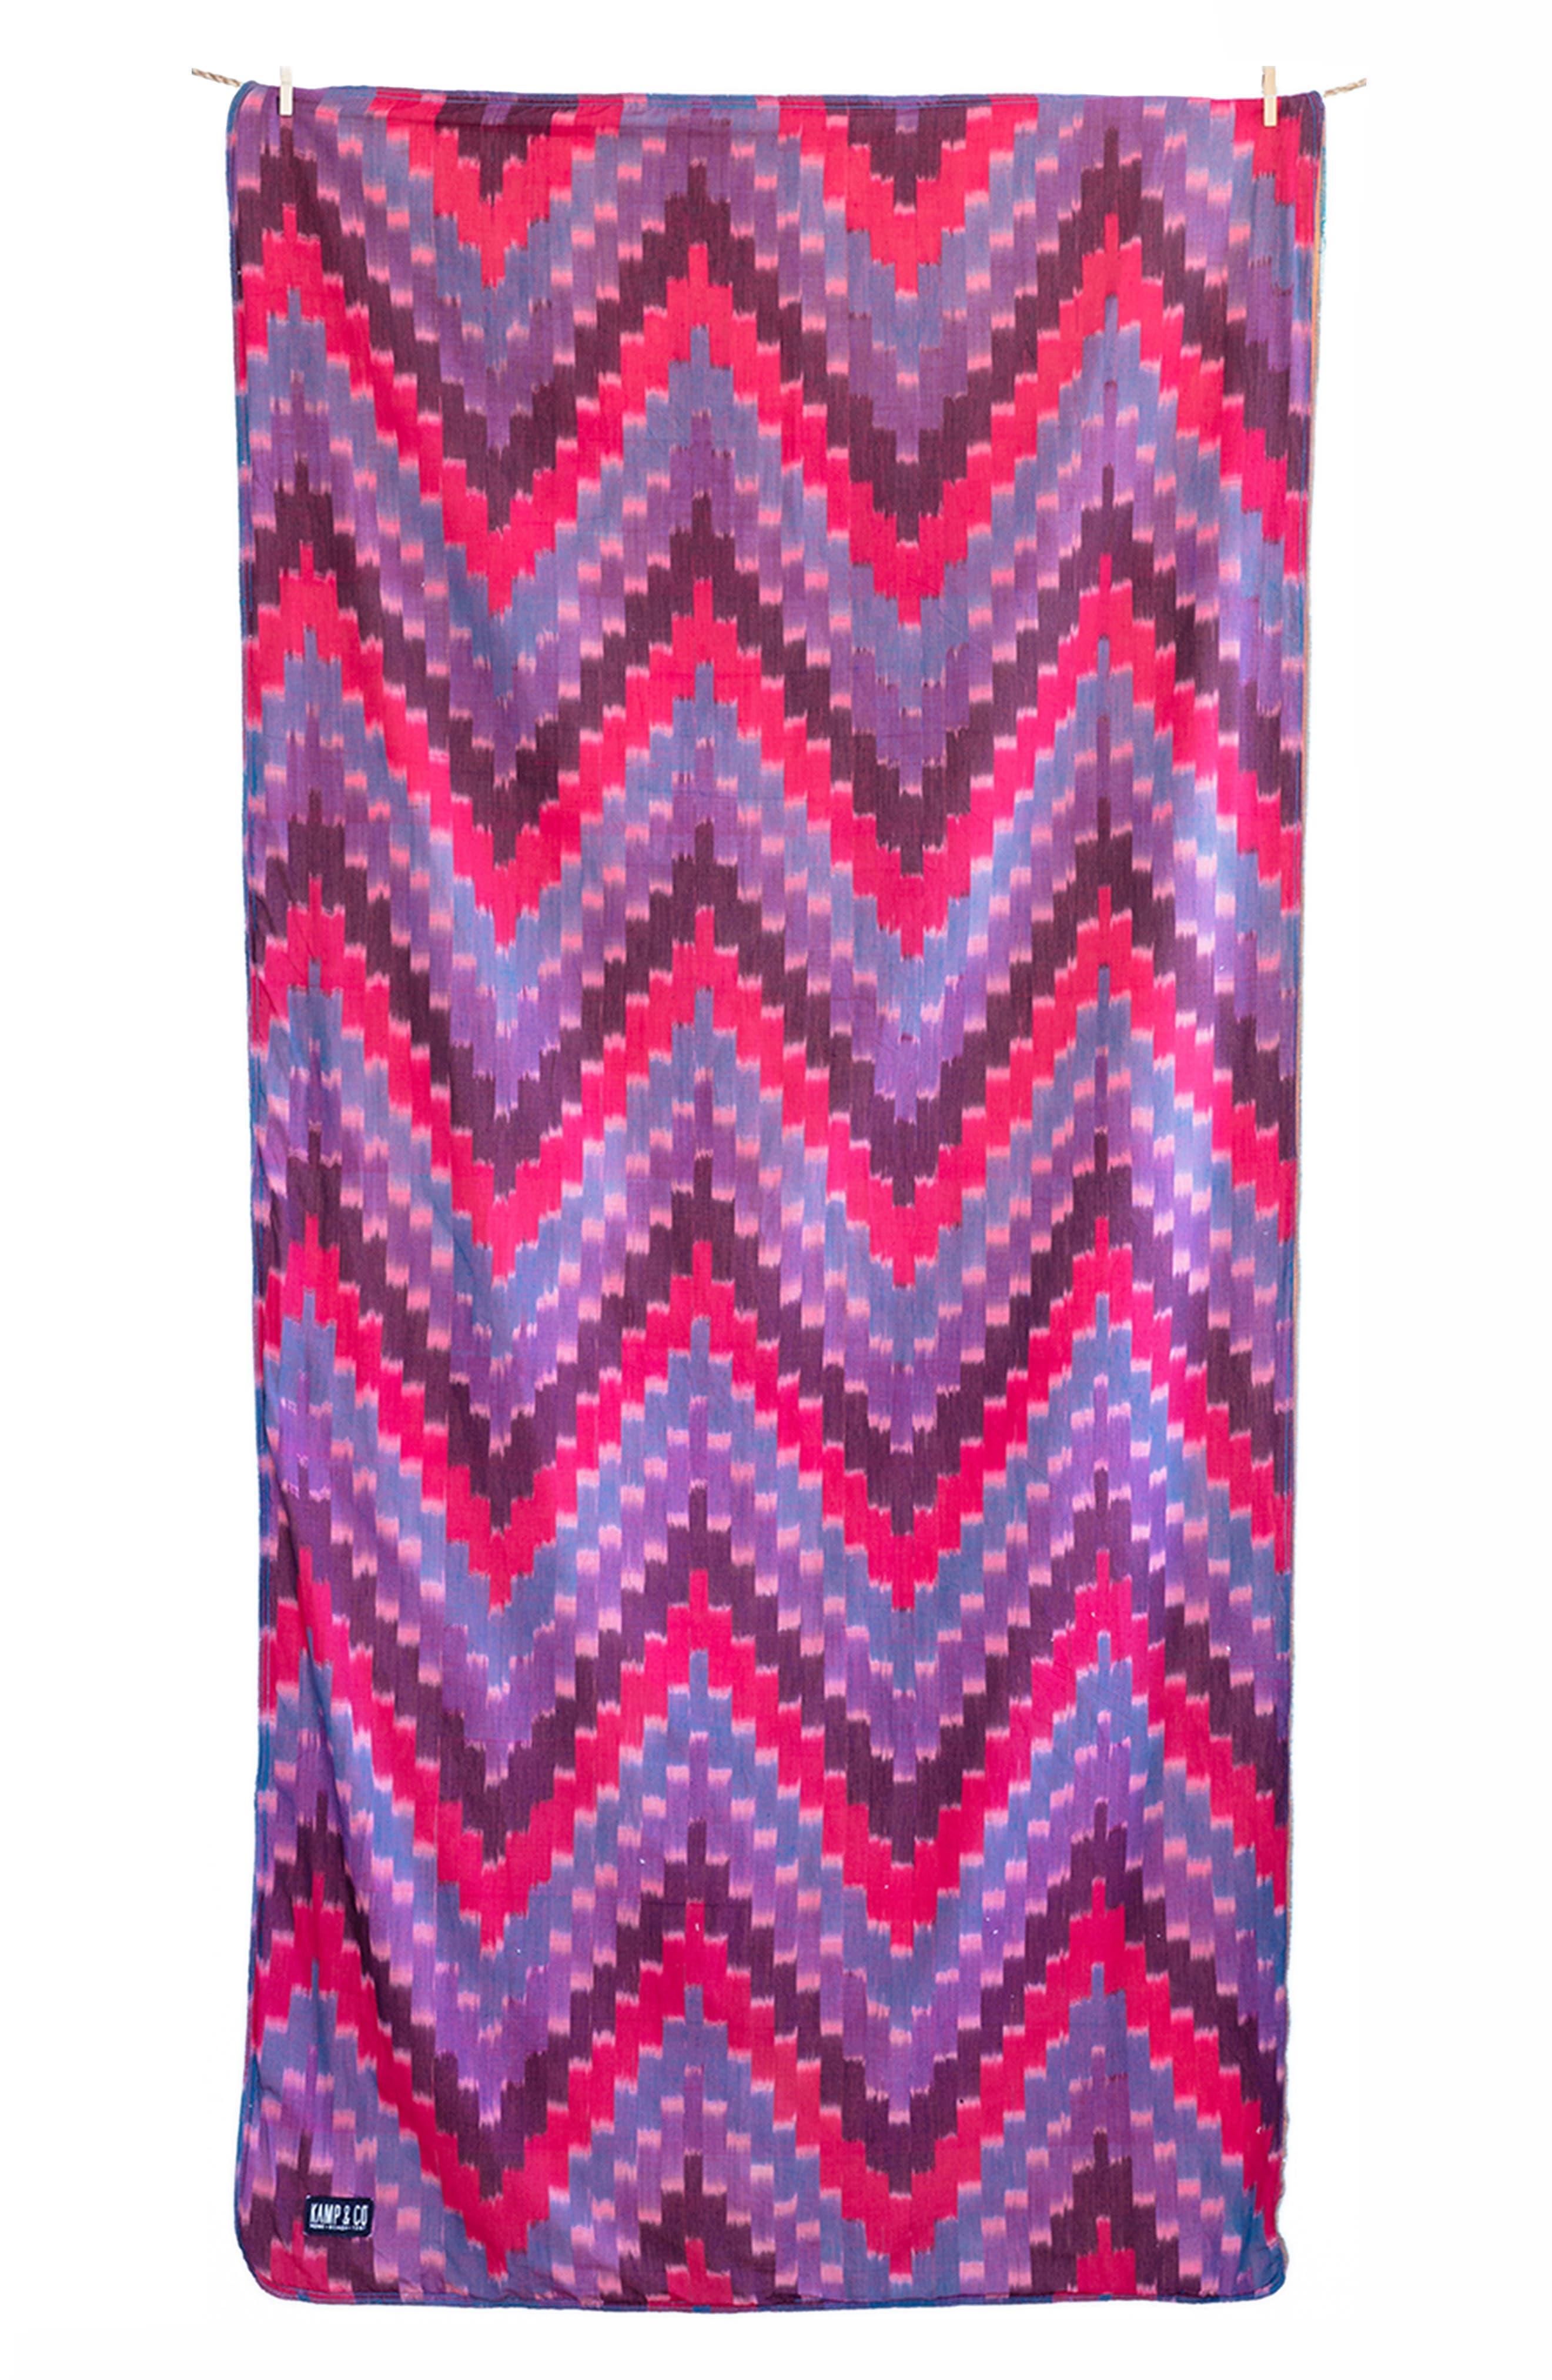 Kamp & Co. Montara Kamp Towel,                             Main thumbnail 1, color,                             500